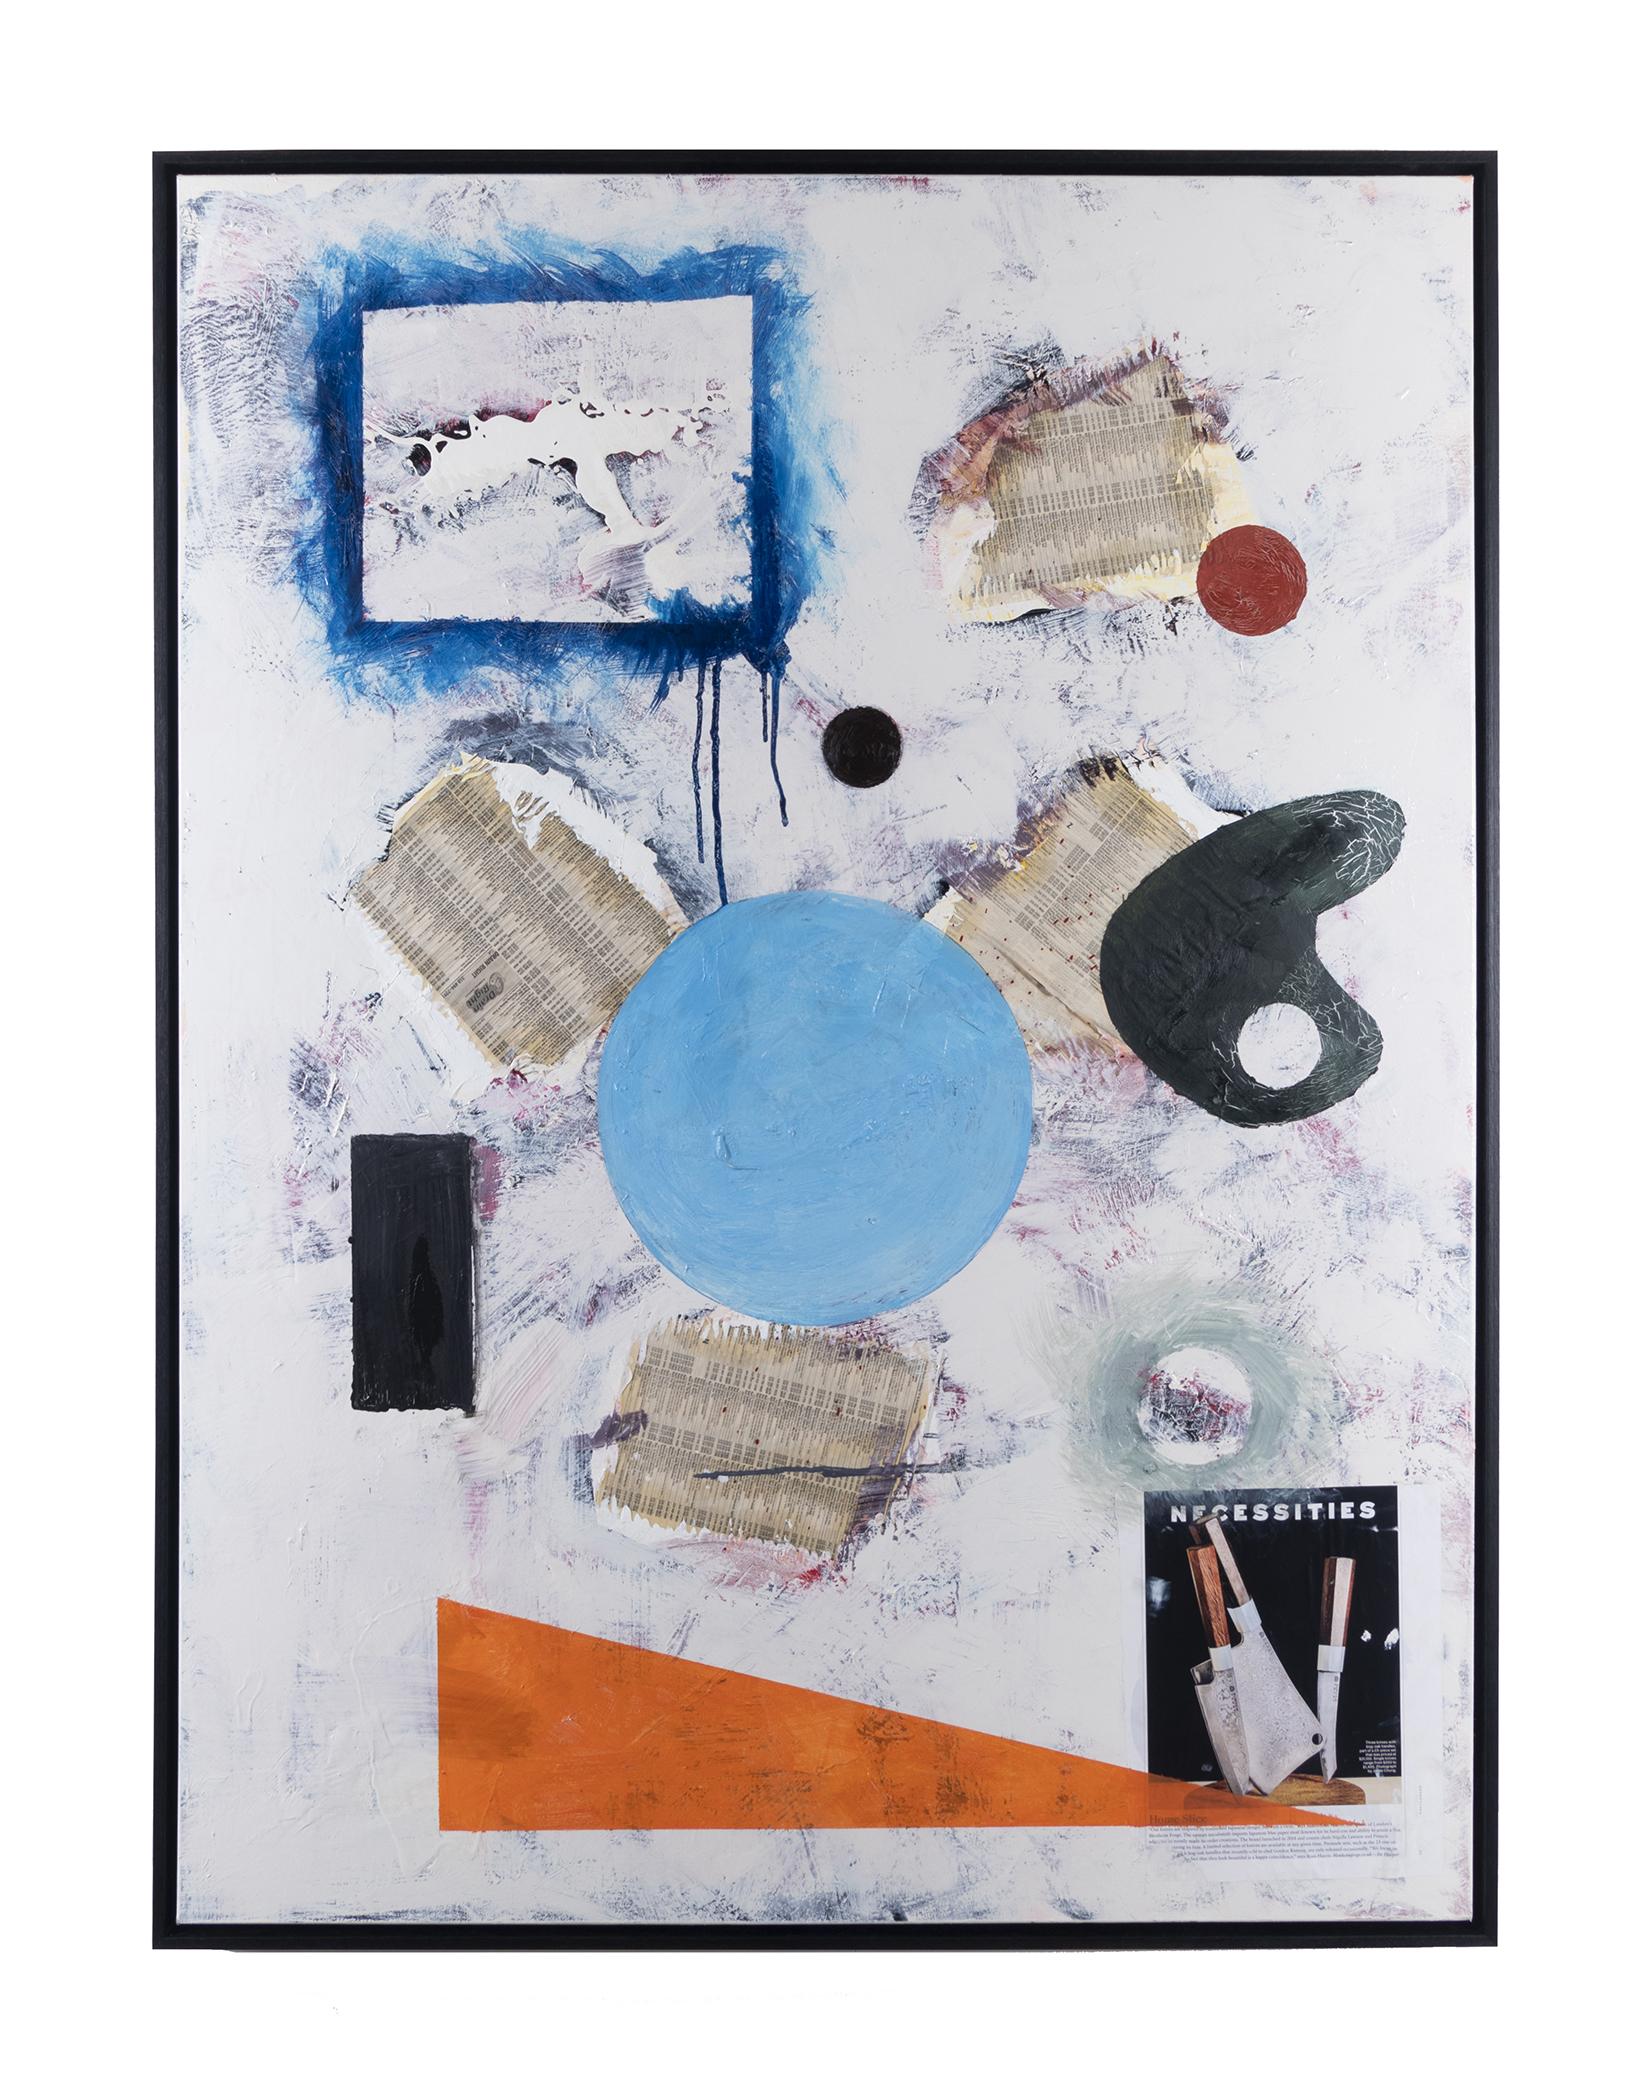 "YUSHEN ZWICKEL REBORN(2019) Oil on Canvas with Mixed Media 36"" x 48"""